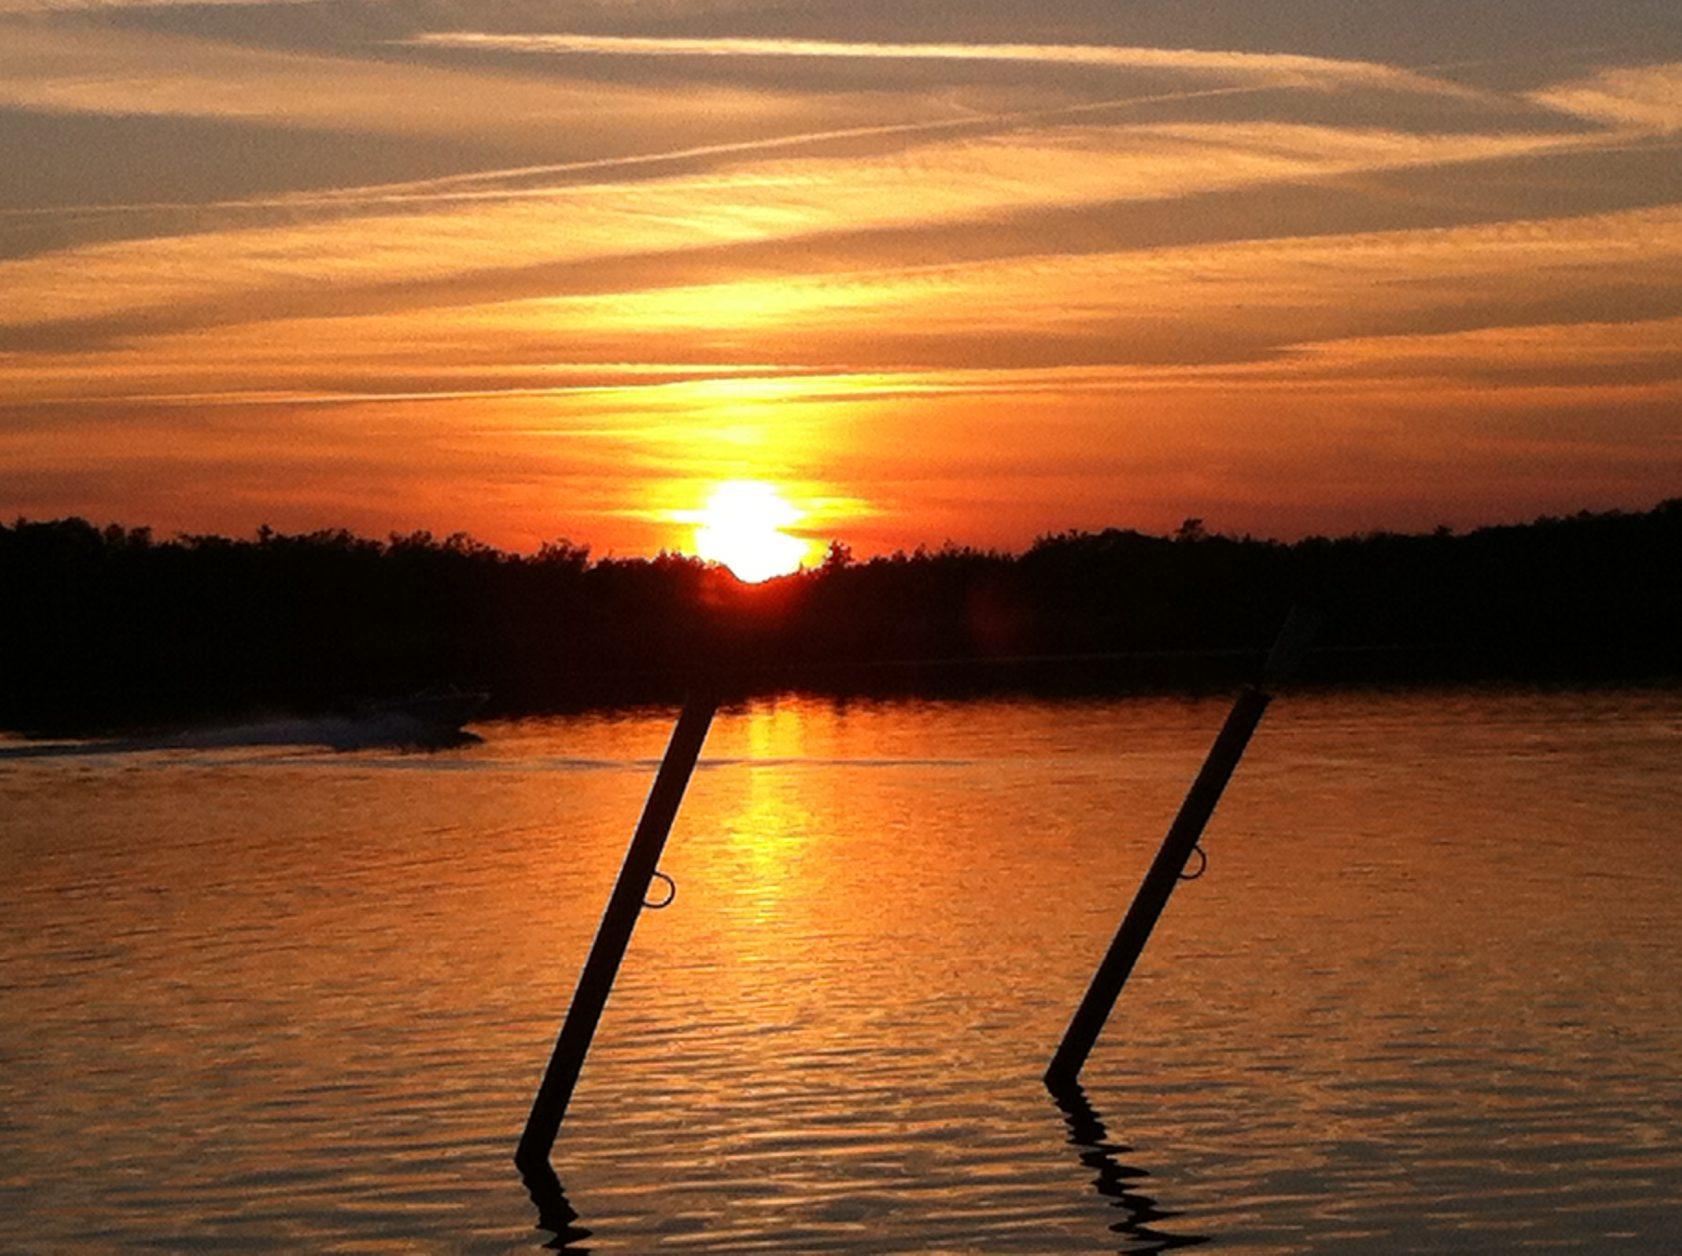 Sonnenuntergang am Schlänitzsee, Foto: D.Weirauch